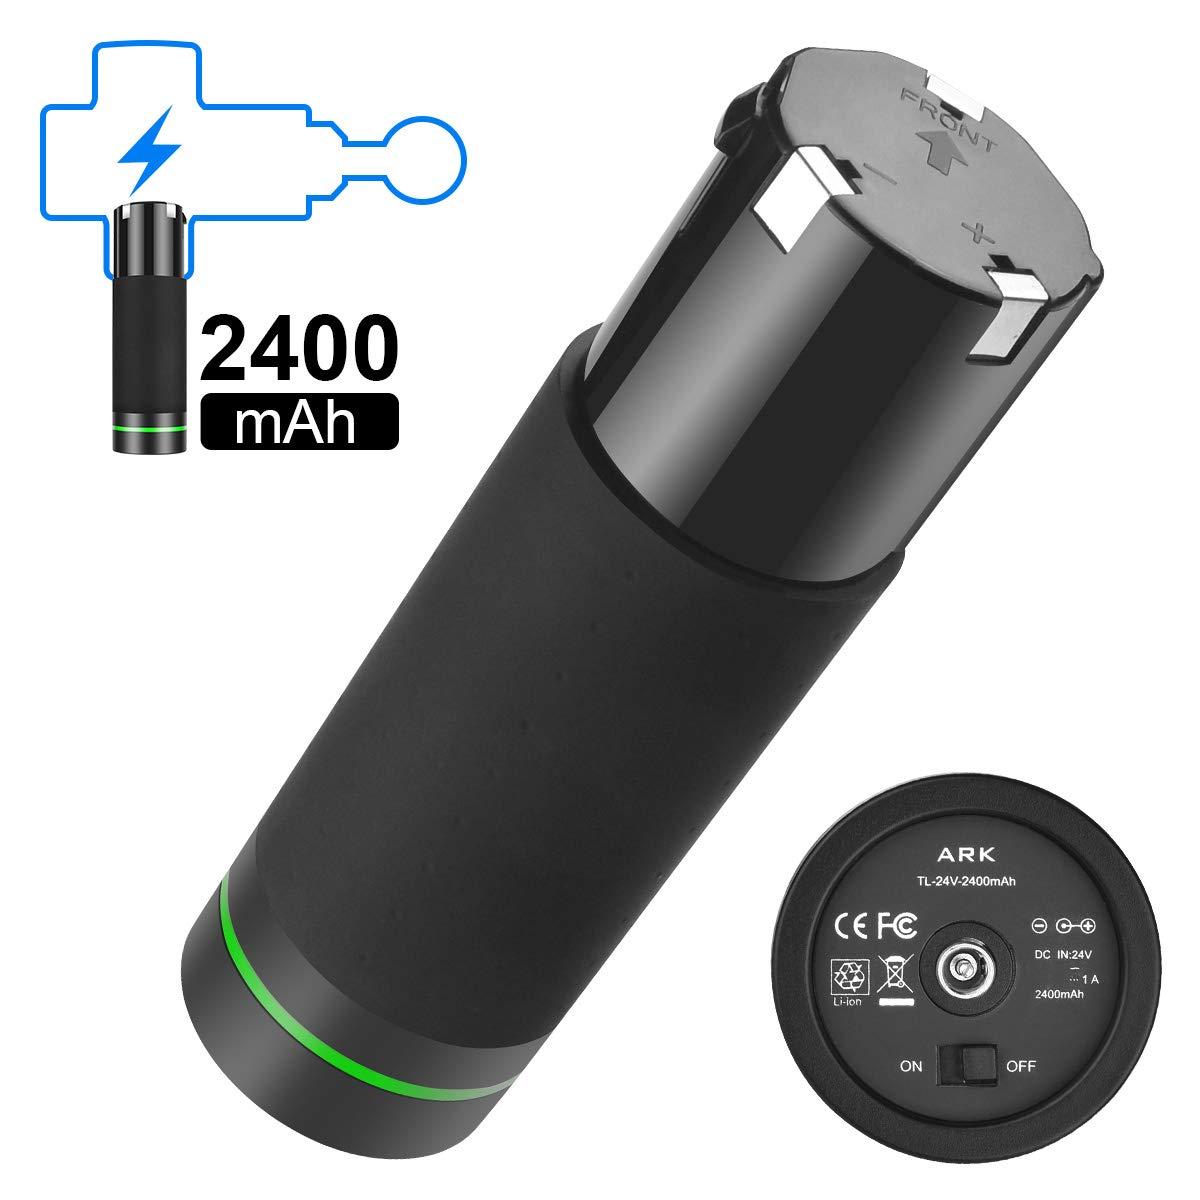 Fascia Massage Gun Battery,2400mah 24V 1A Battery for Rechargeable Deep Tissue Massager&Muscle Portable Massage by yotakoya